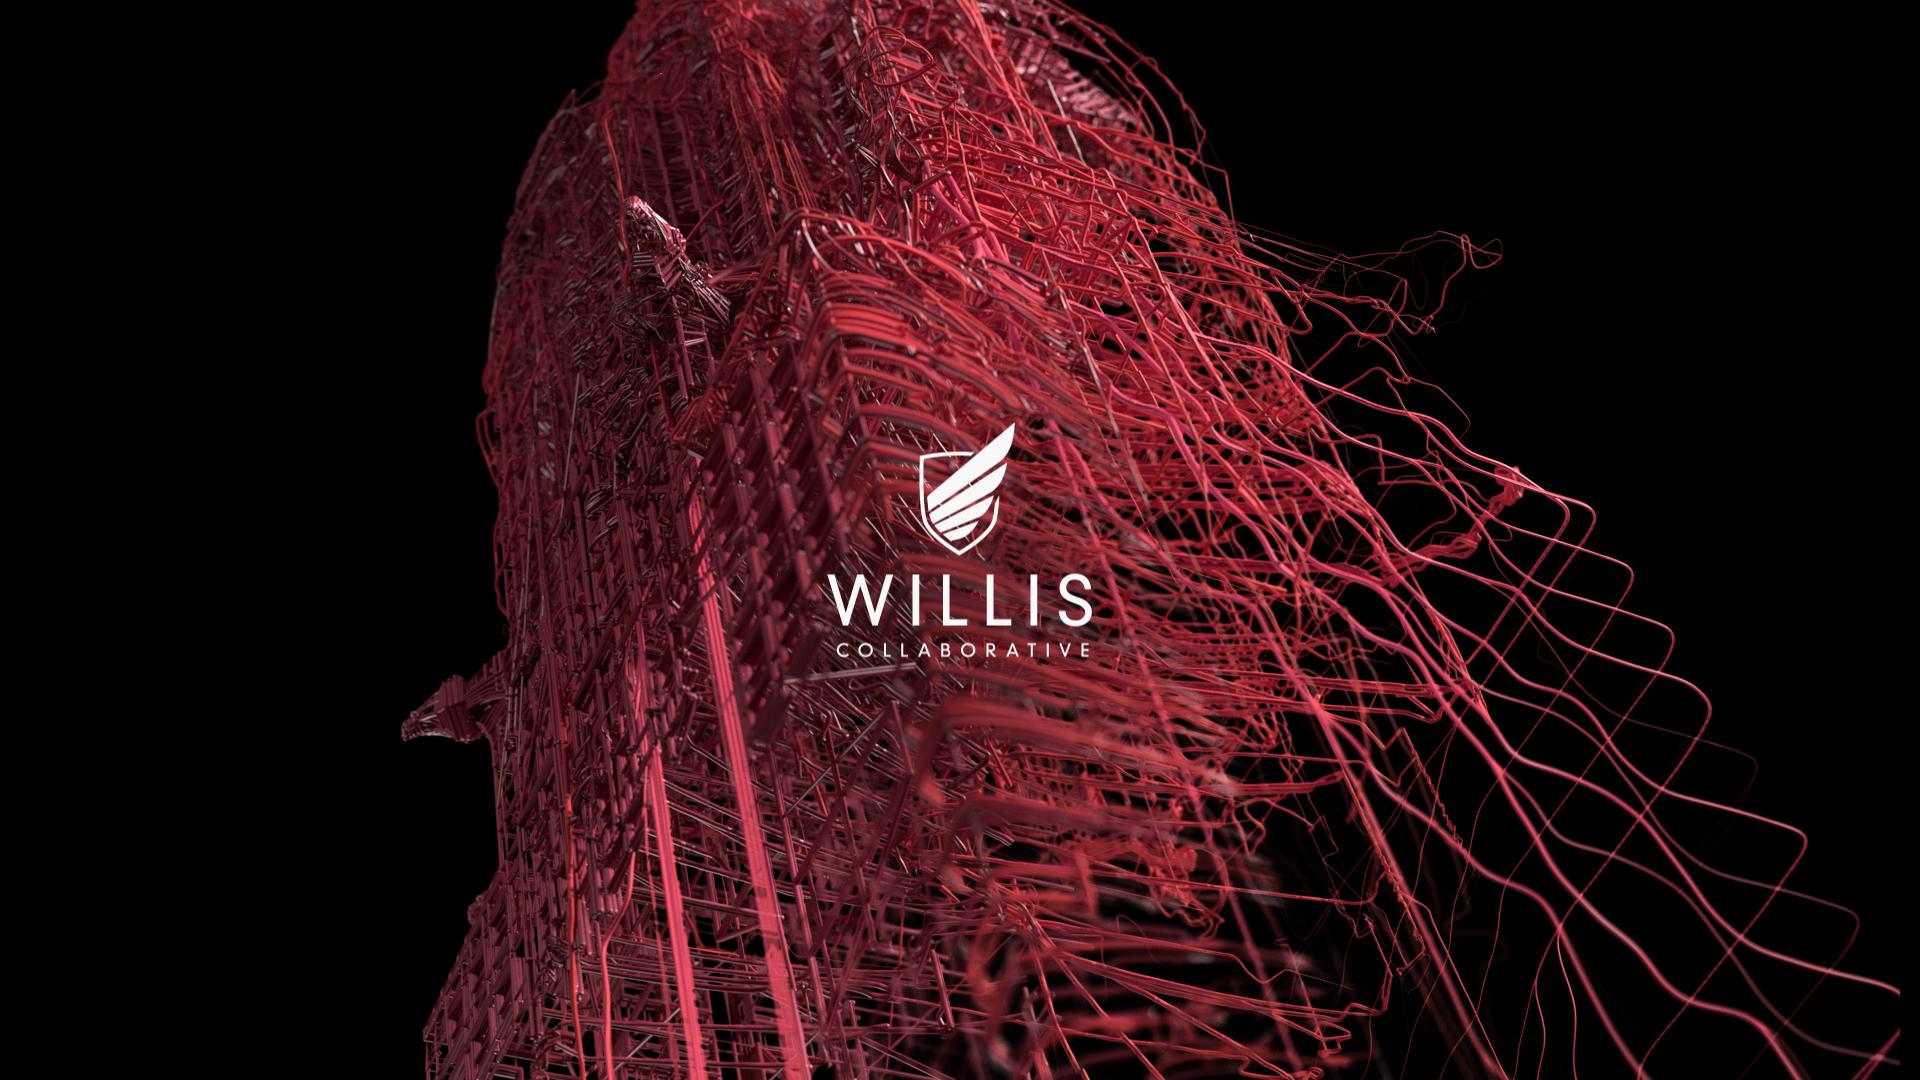 Willis Collaborative Branding